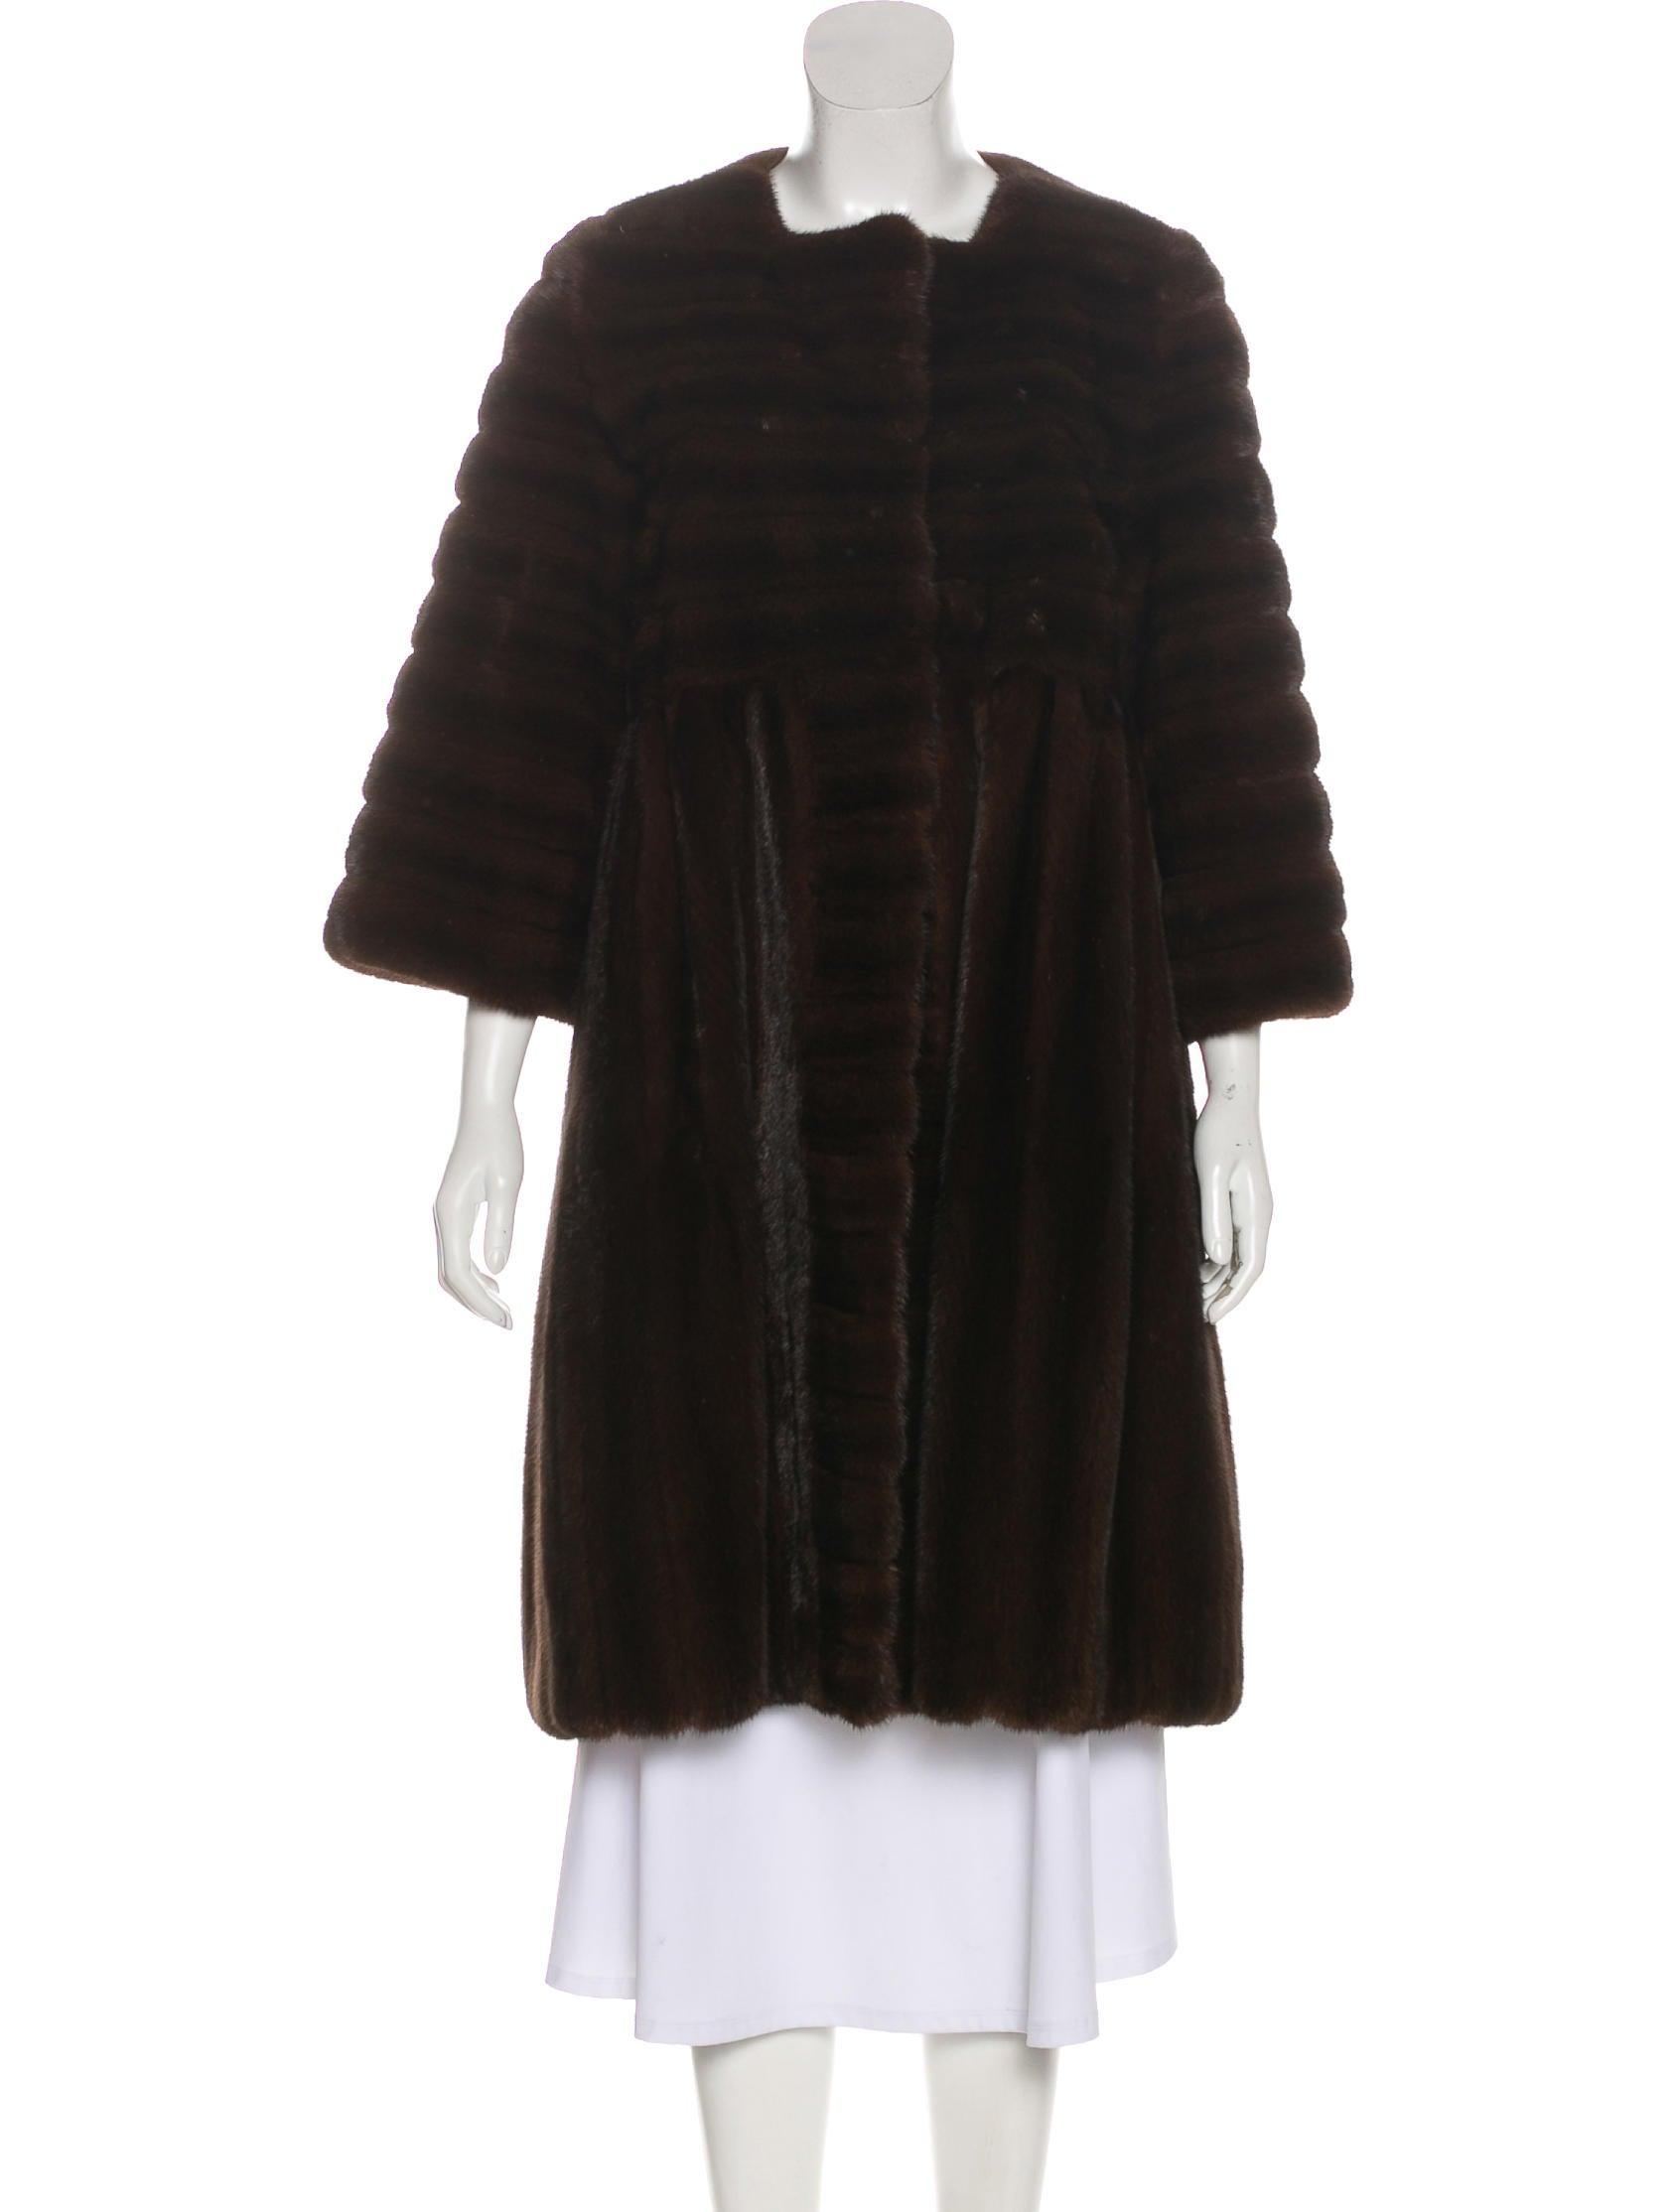 c5854f552 Fur | The RealReal